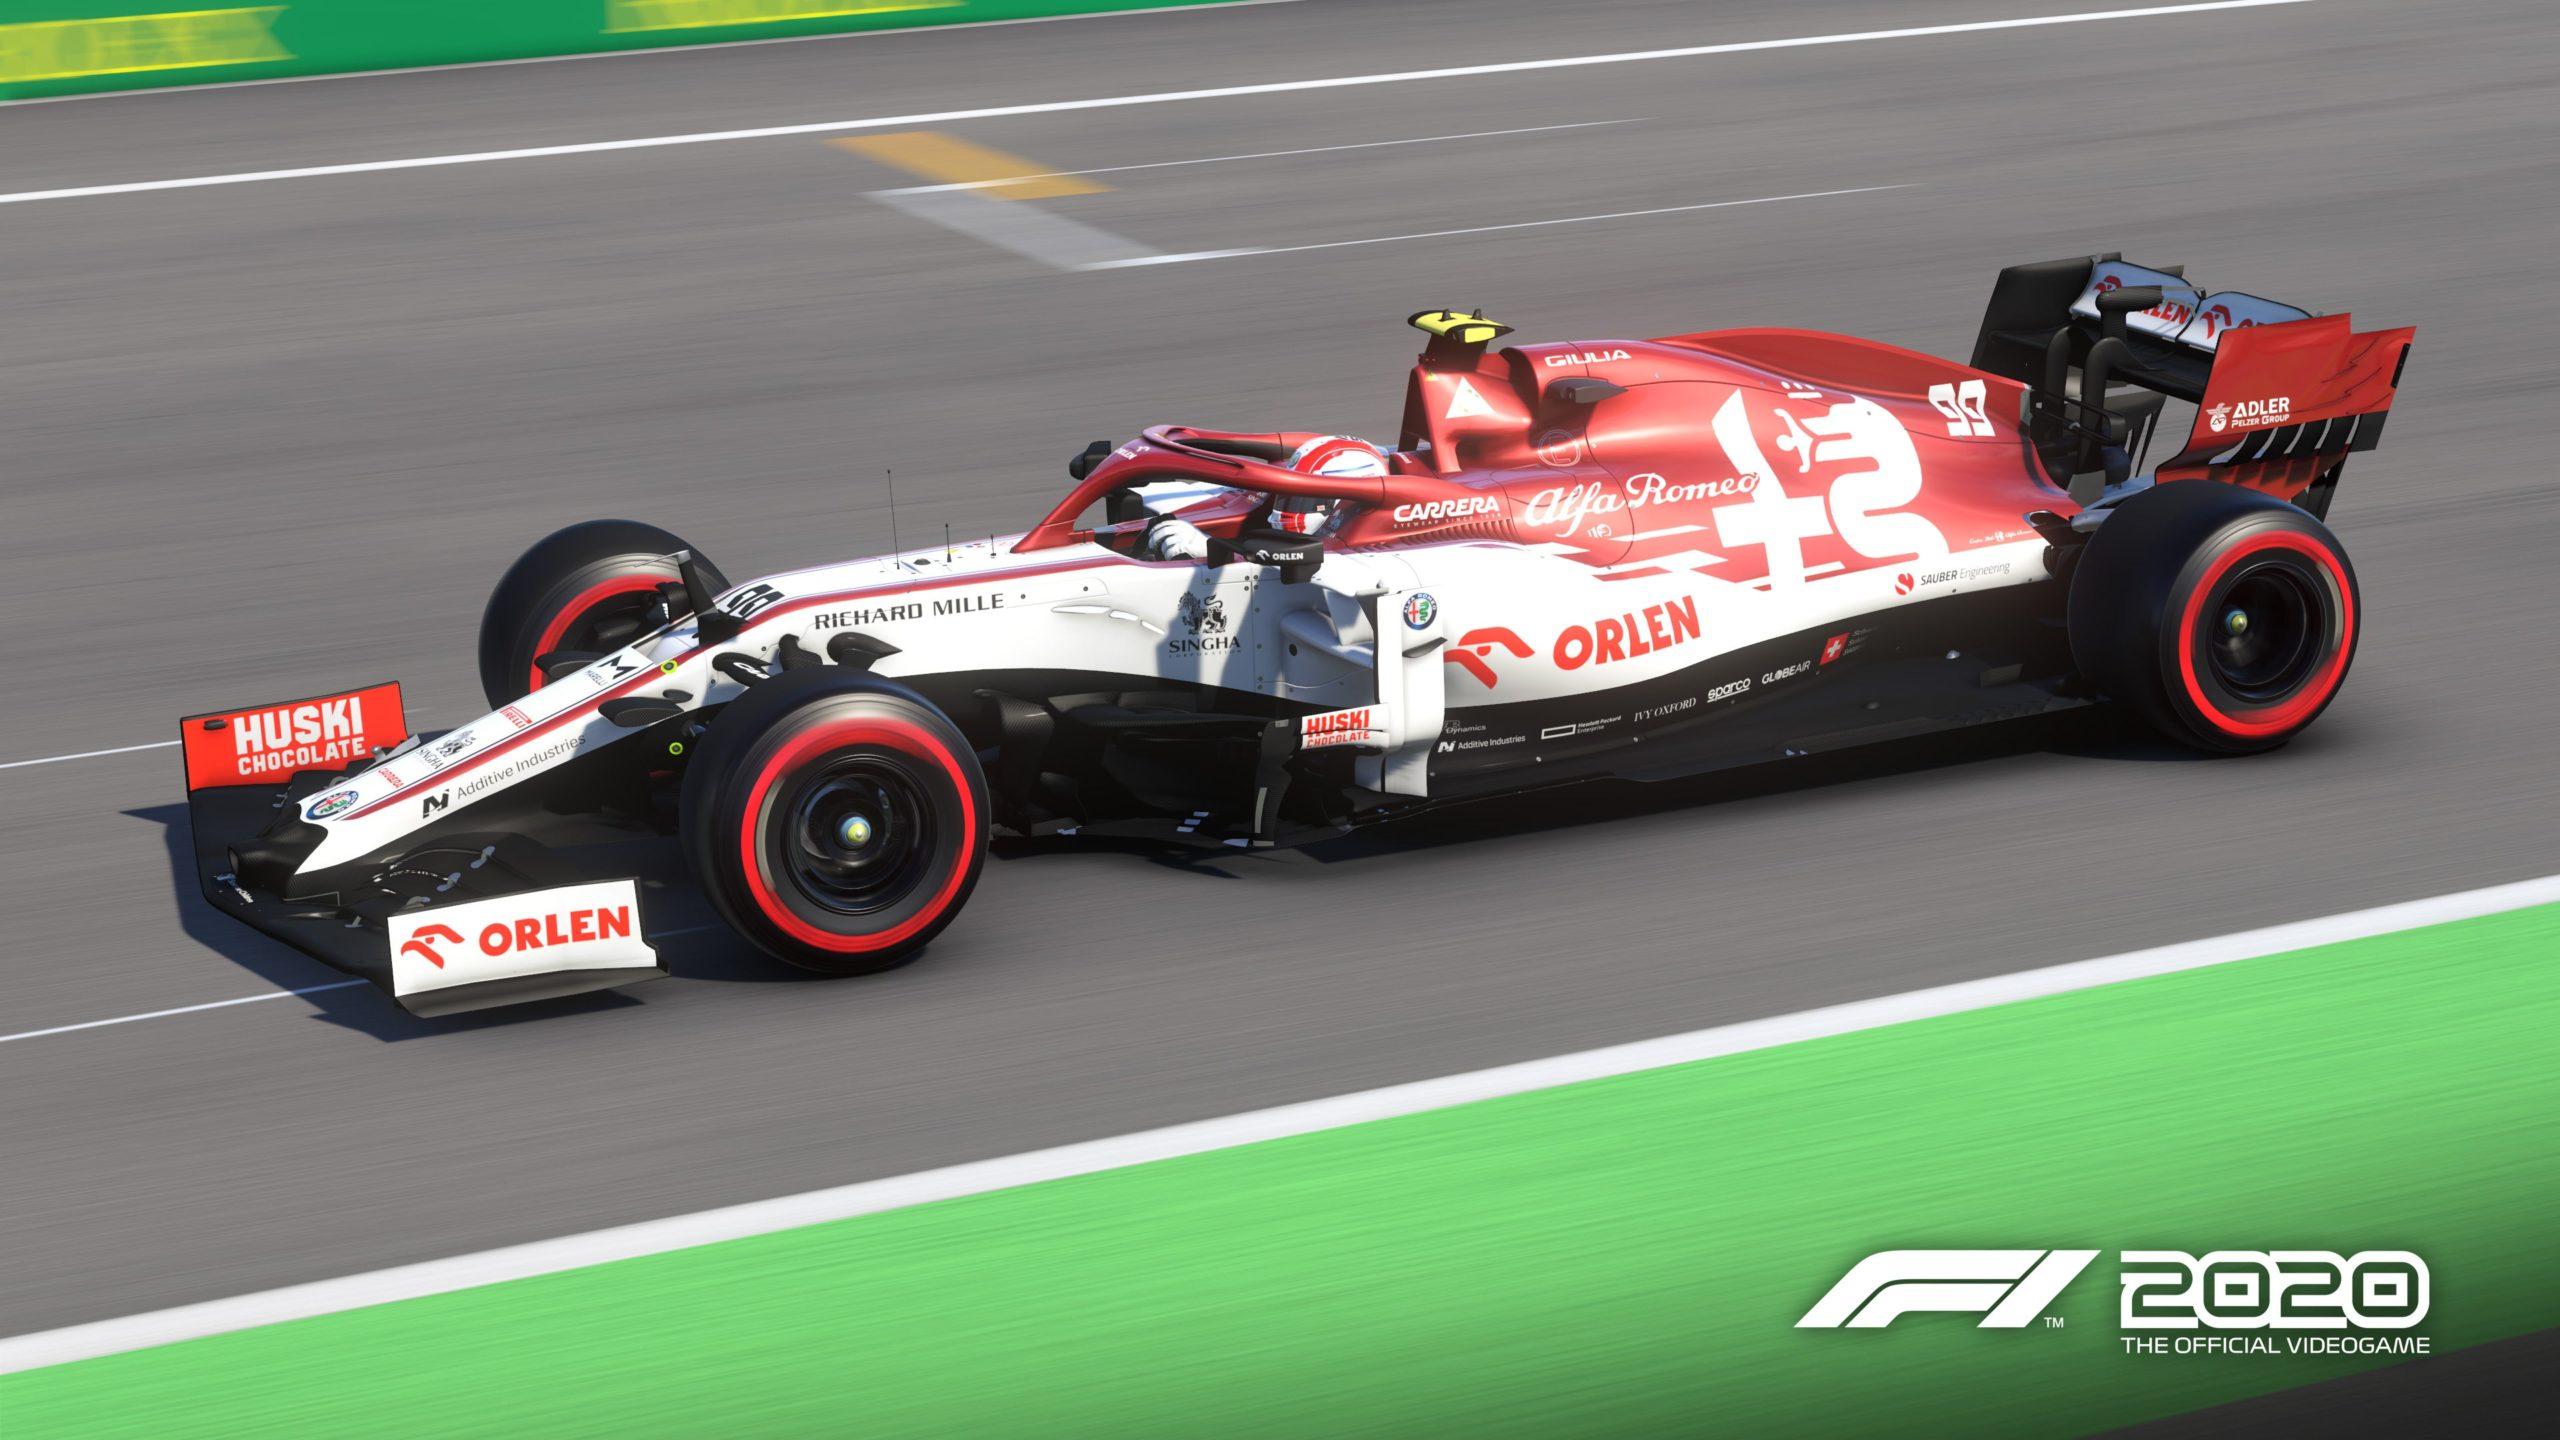 F1-2020_Hungary_Screen_05_4K